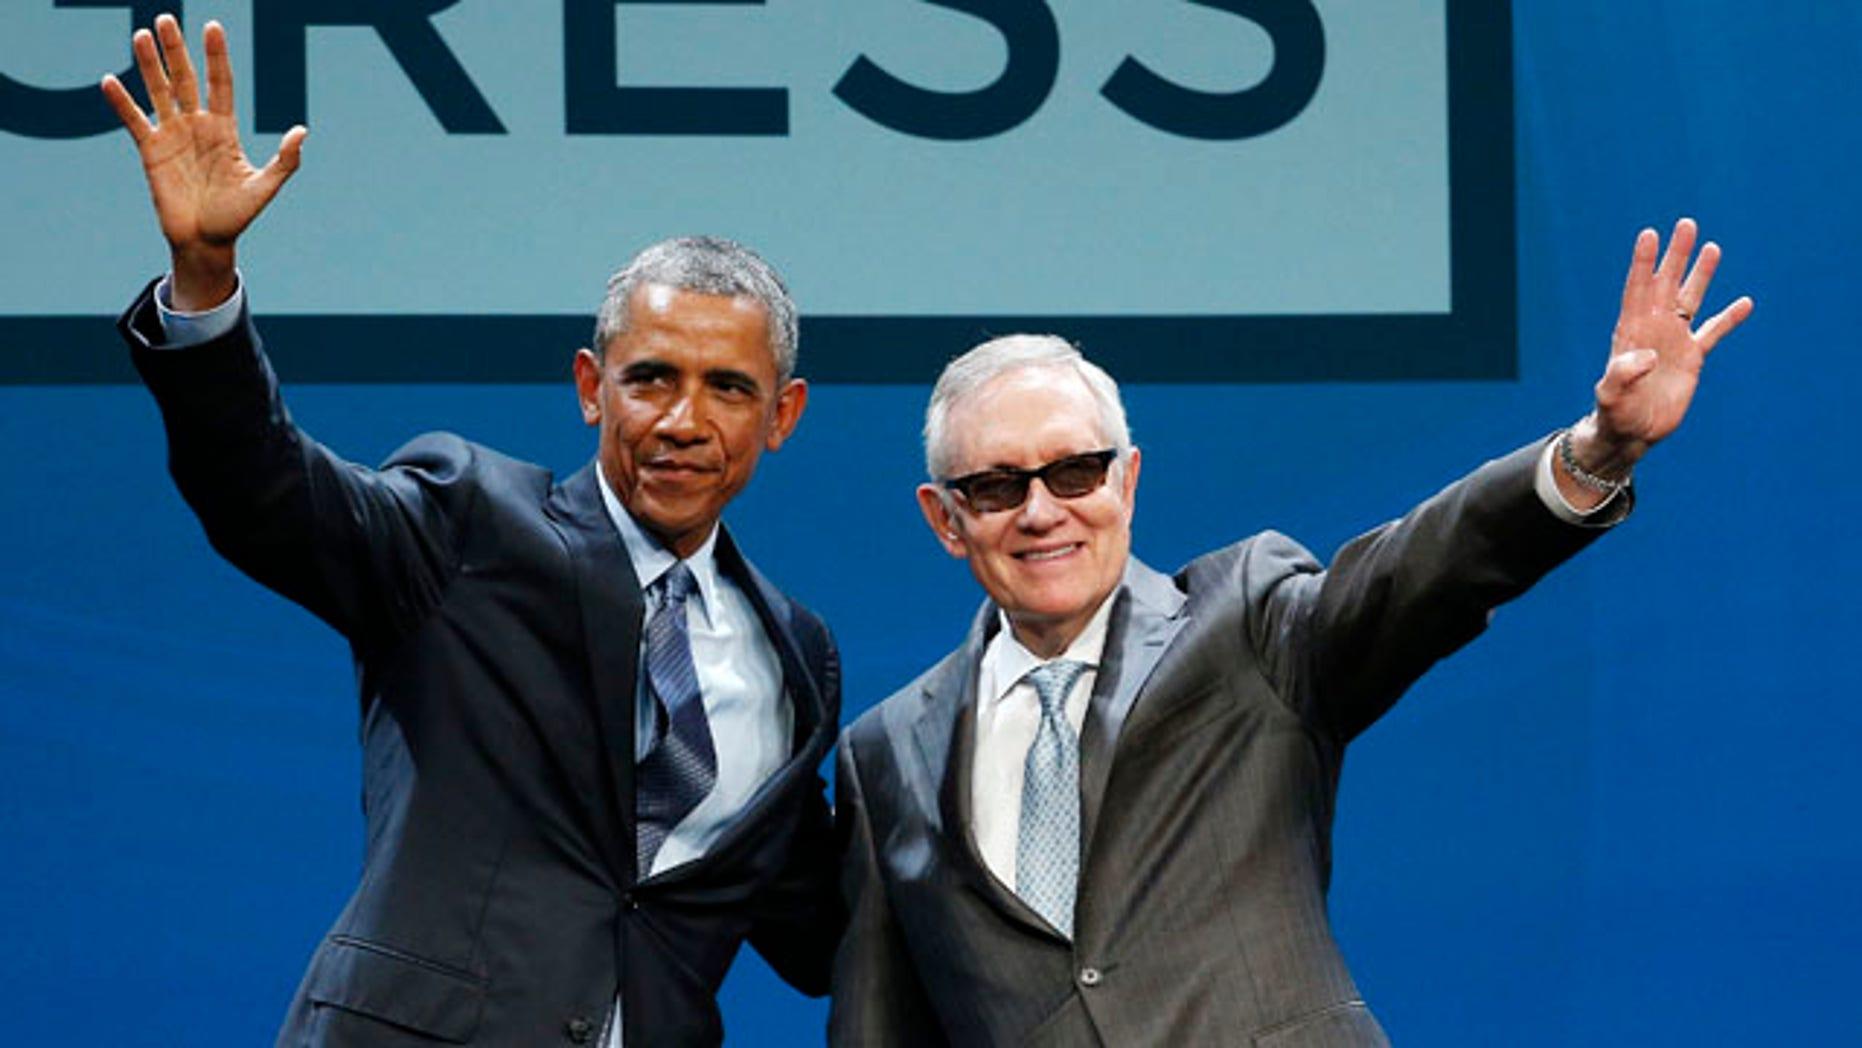 Aug. 24, 2015: President Barack Obama, left, and Senate Minority Leader Sen. Harry Reid wave onstage at the National Clean Energy Summit in Las Vegas. (AP Photo/John Locher)